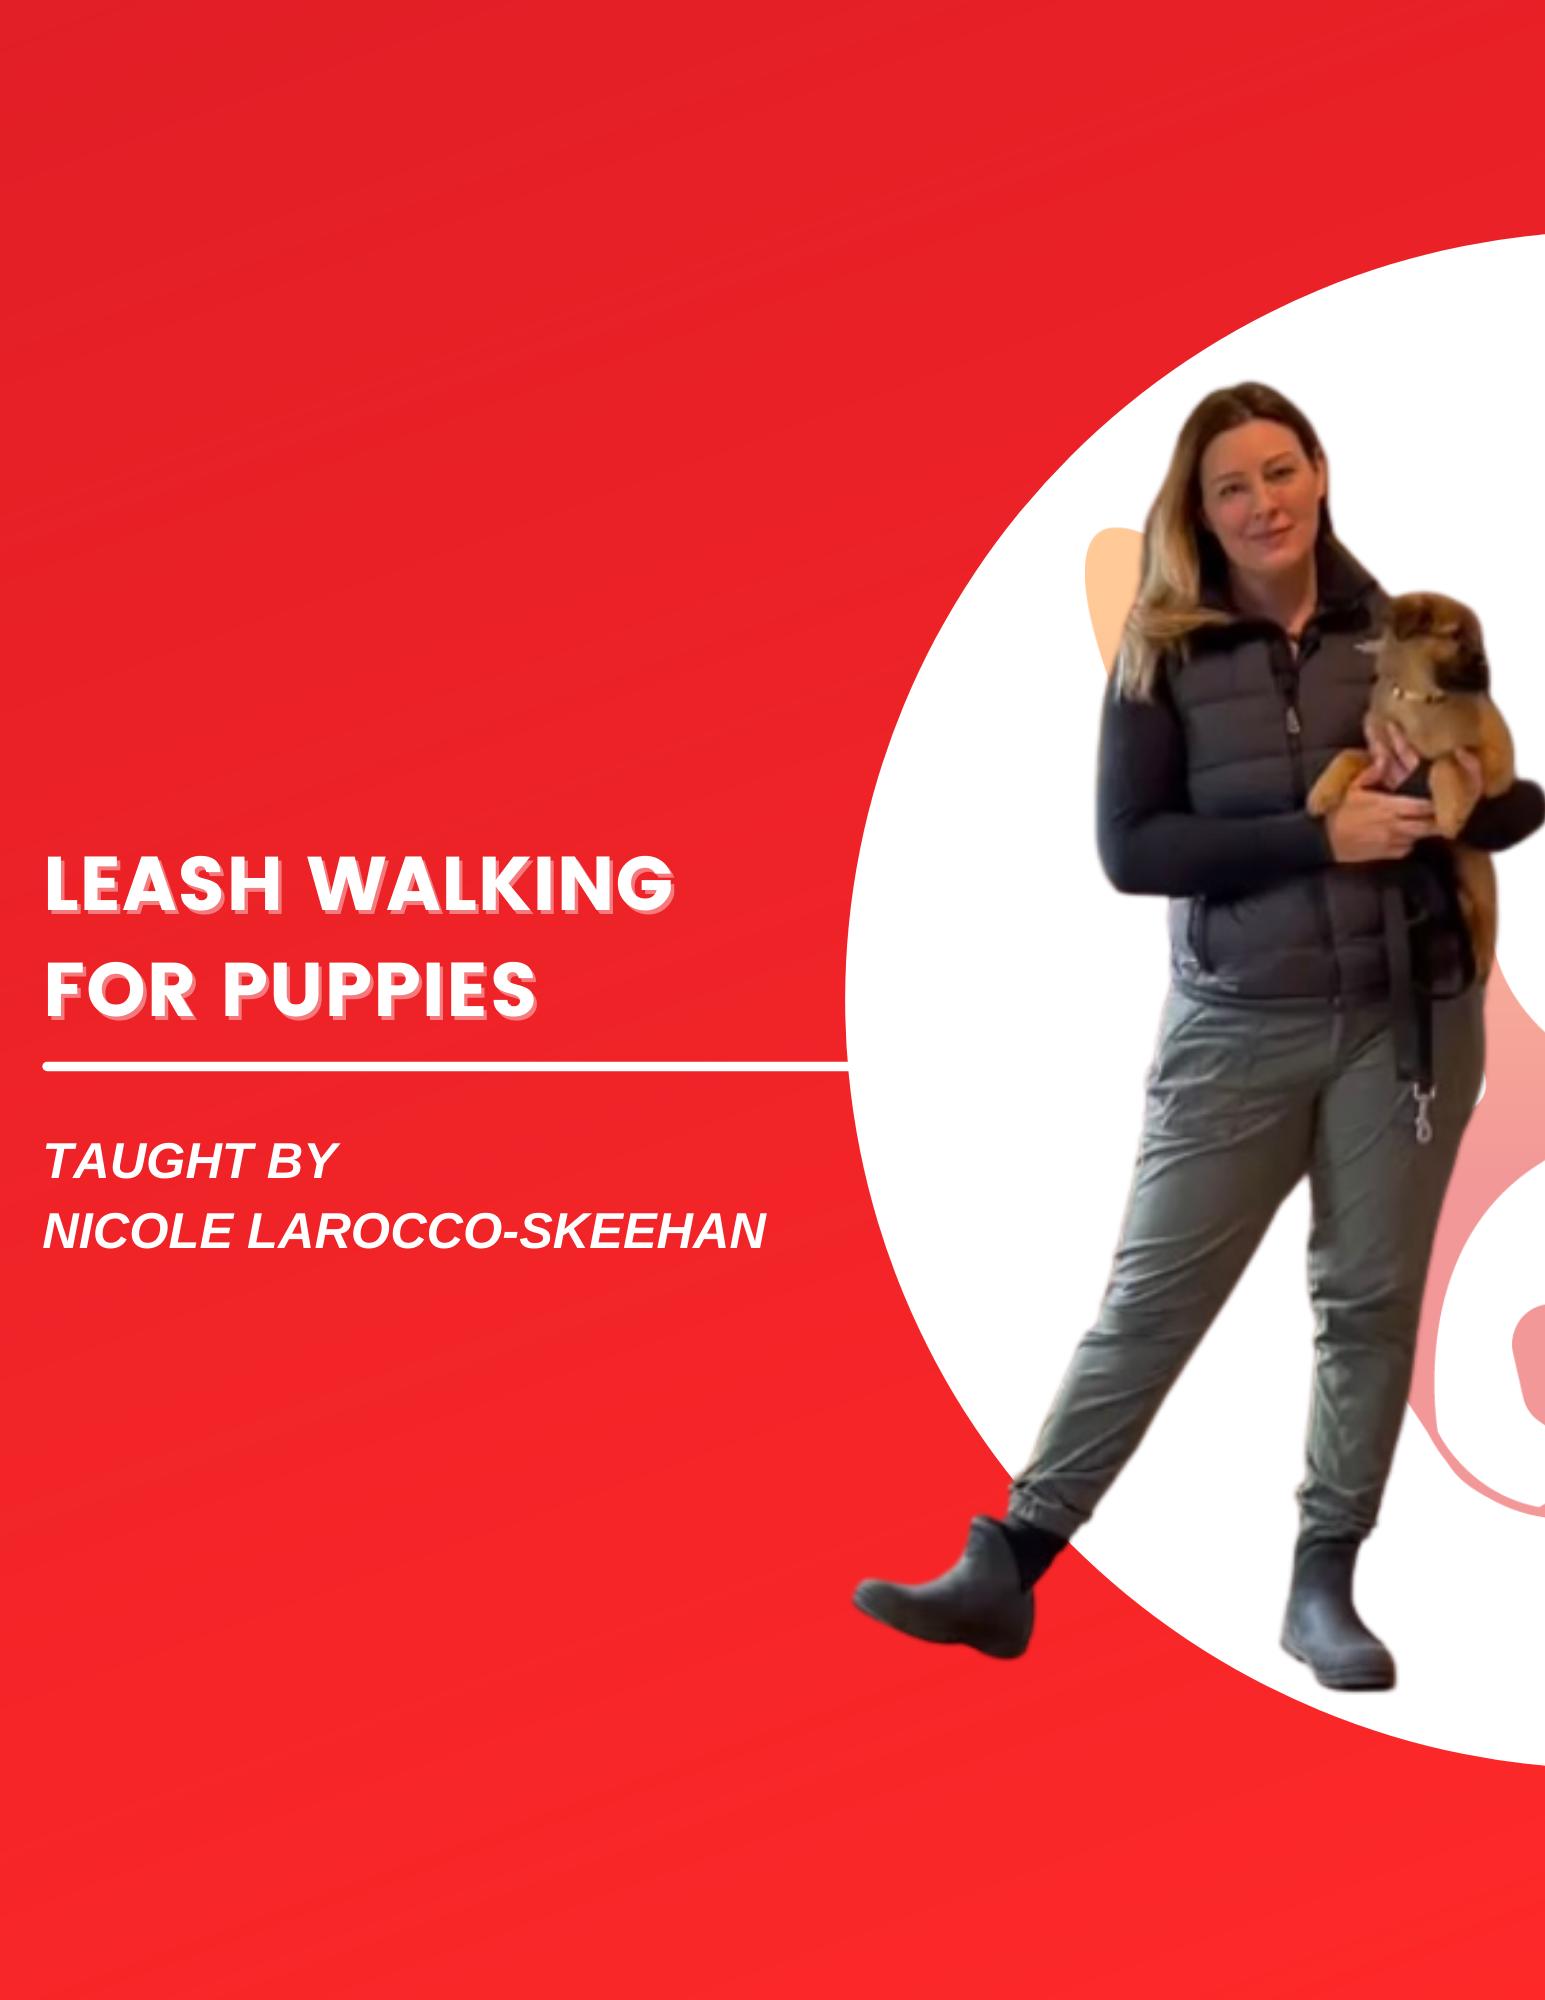 puppy leash walking video tutorial